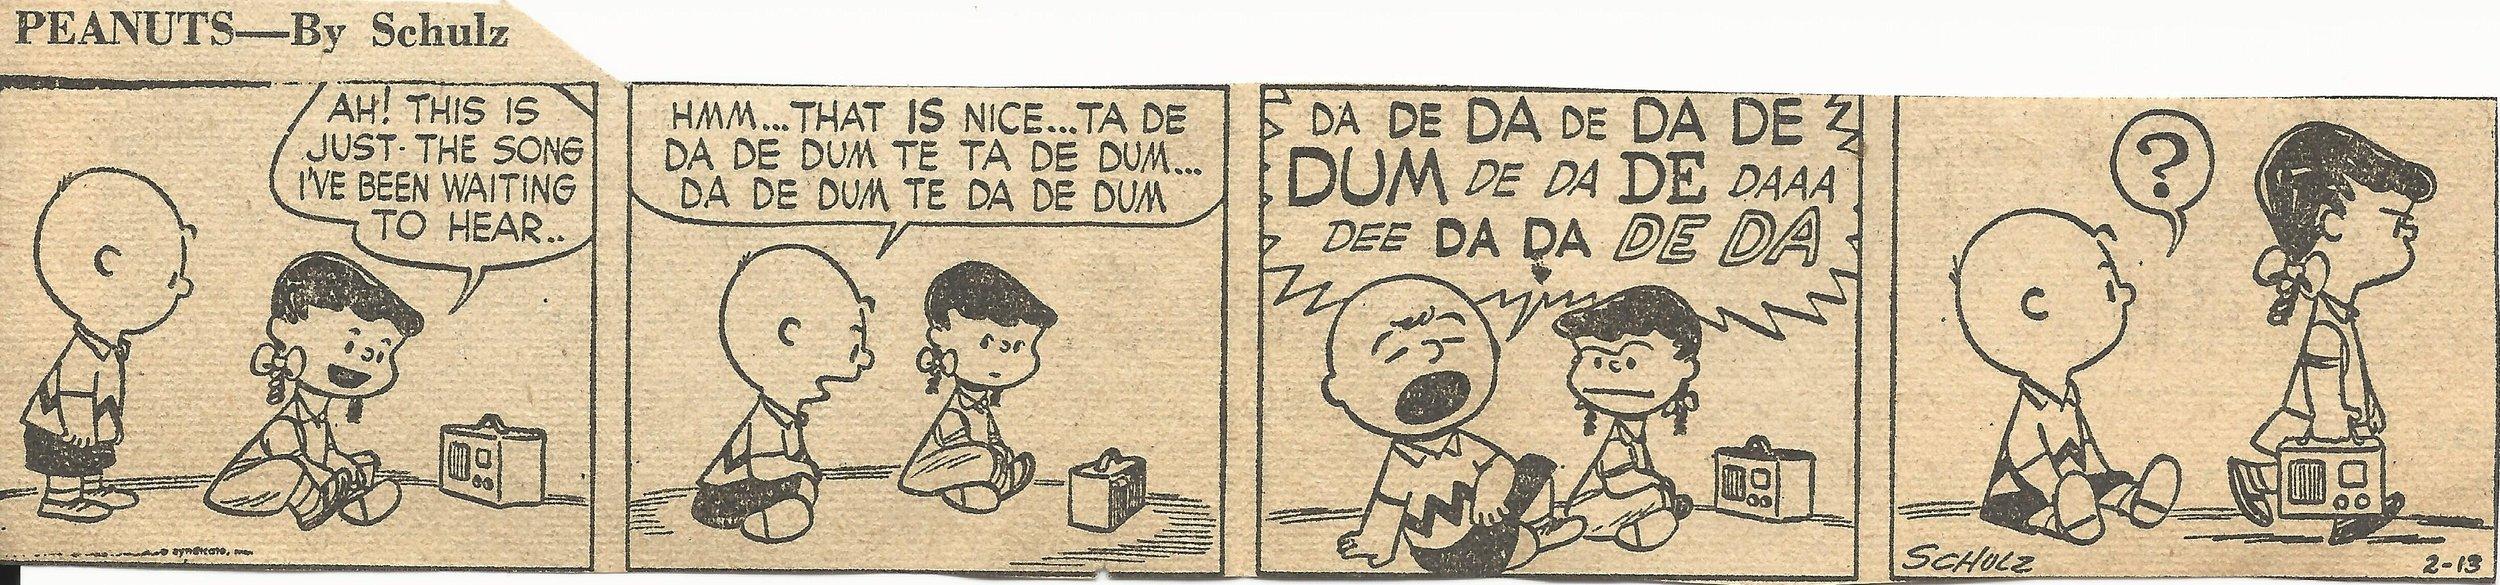 Feb. 15, 1953 (Marj)_Peanuts_1.jpg